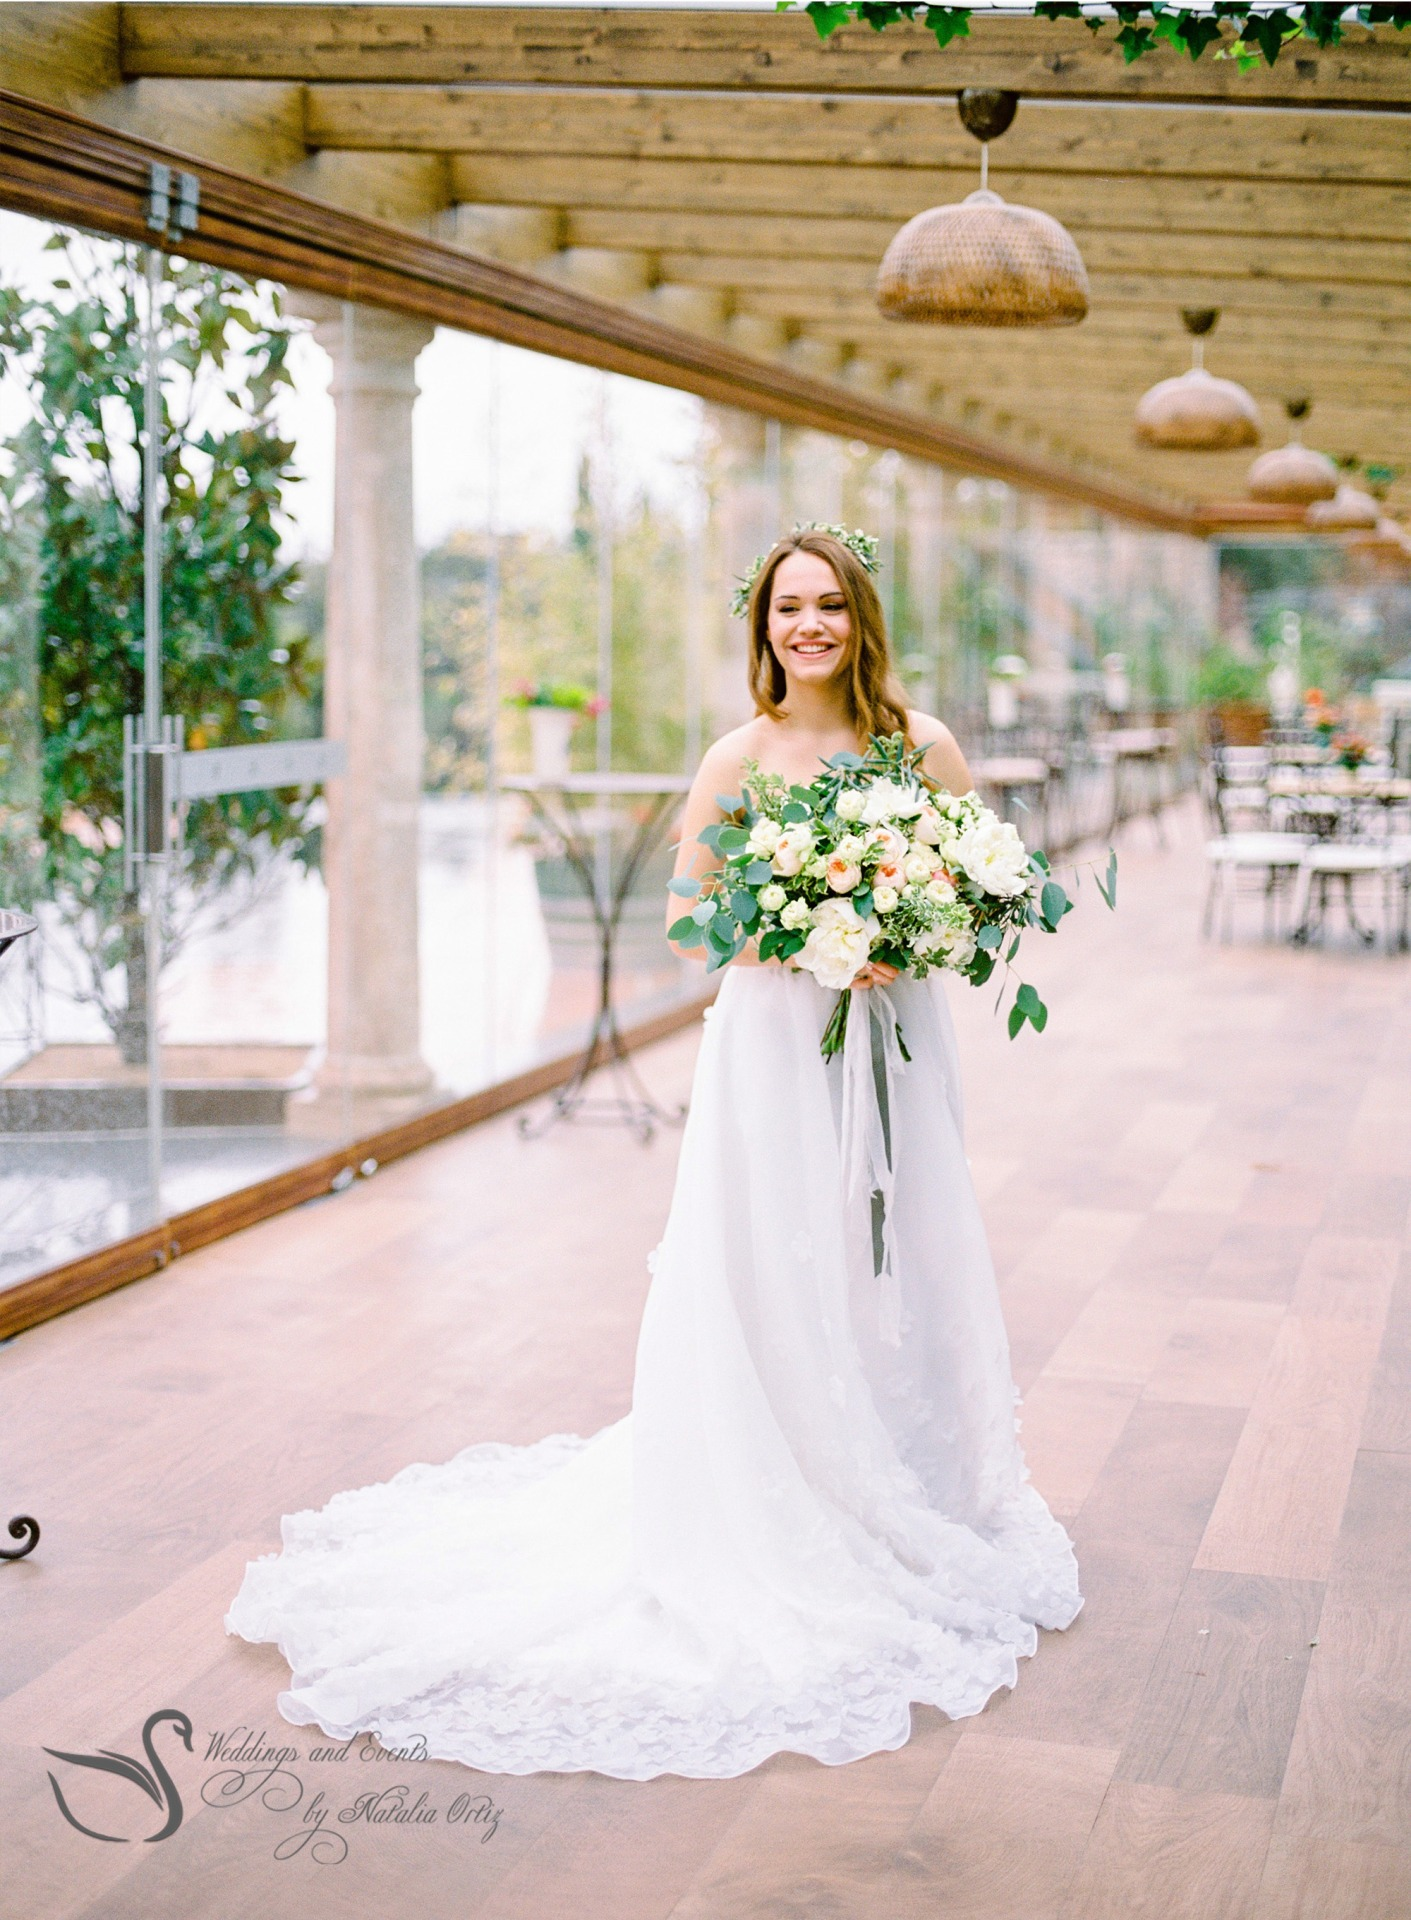 Весенняя свадьба в Испании